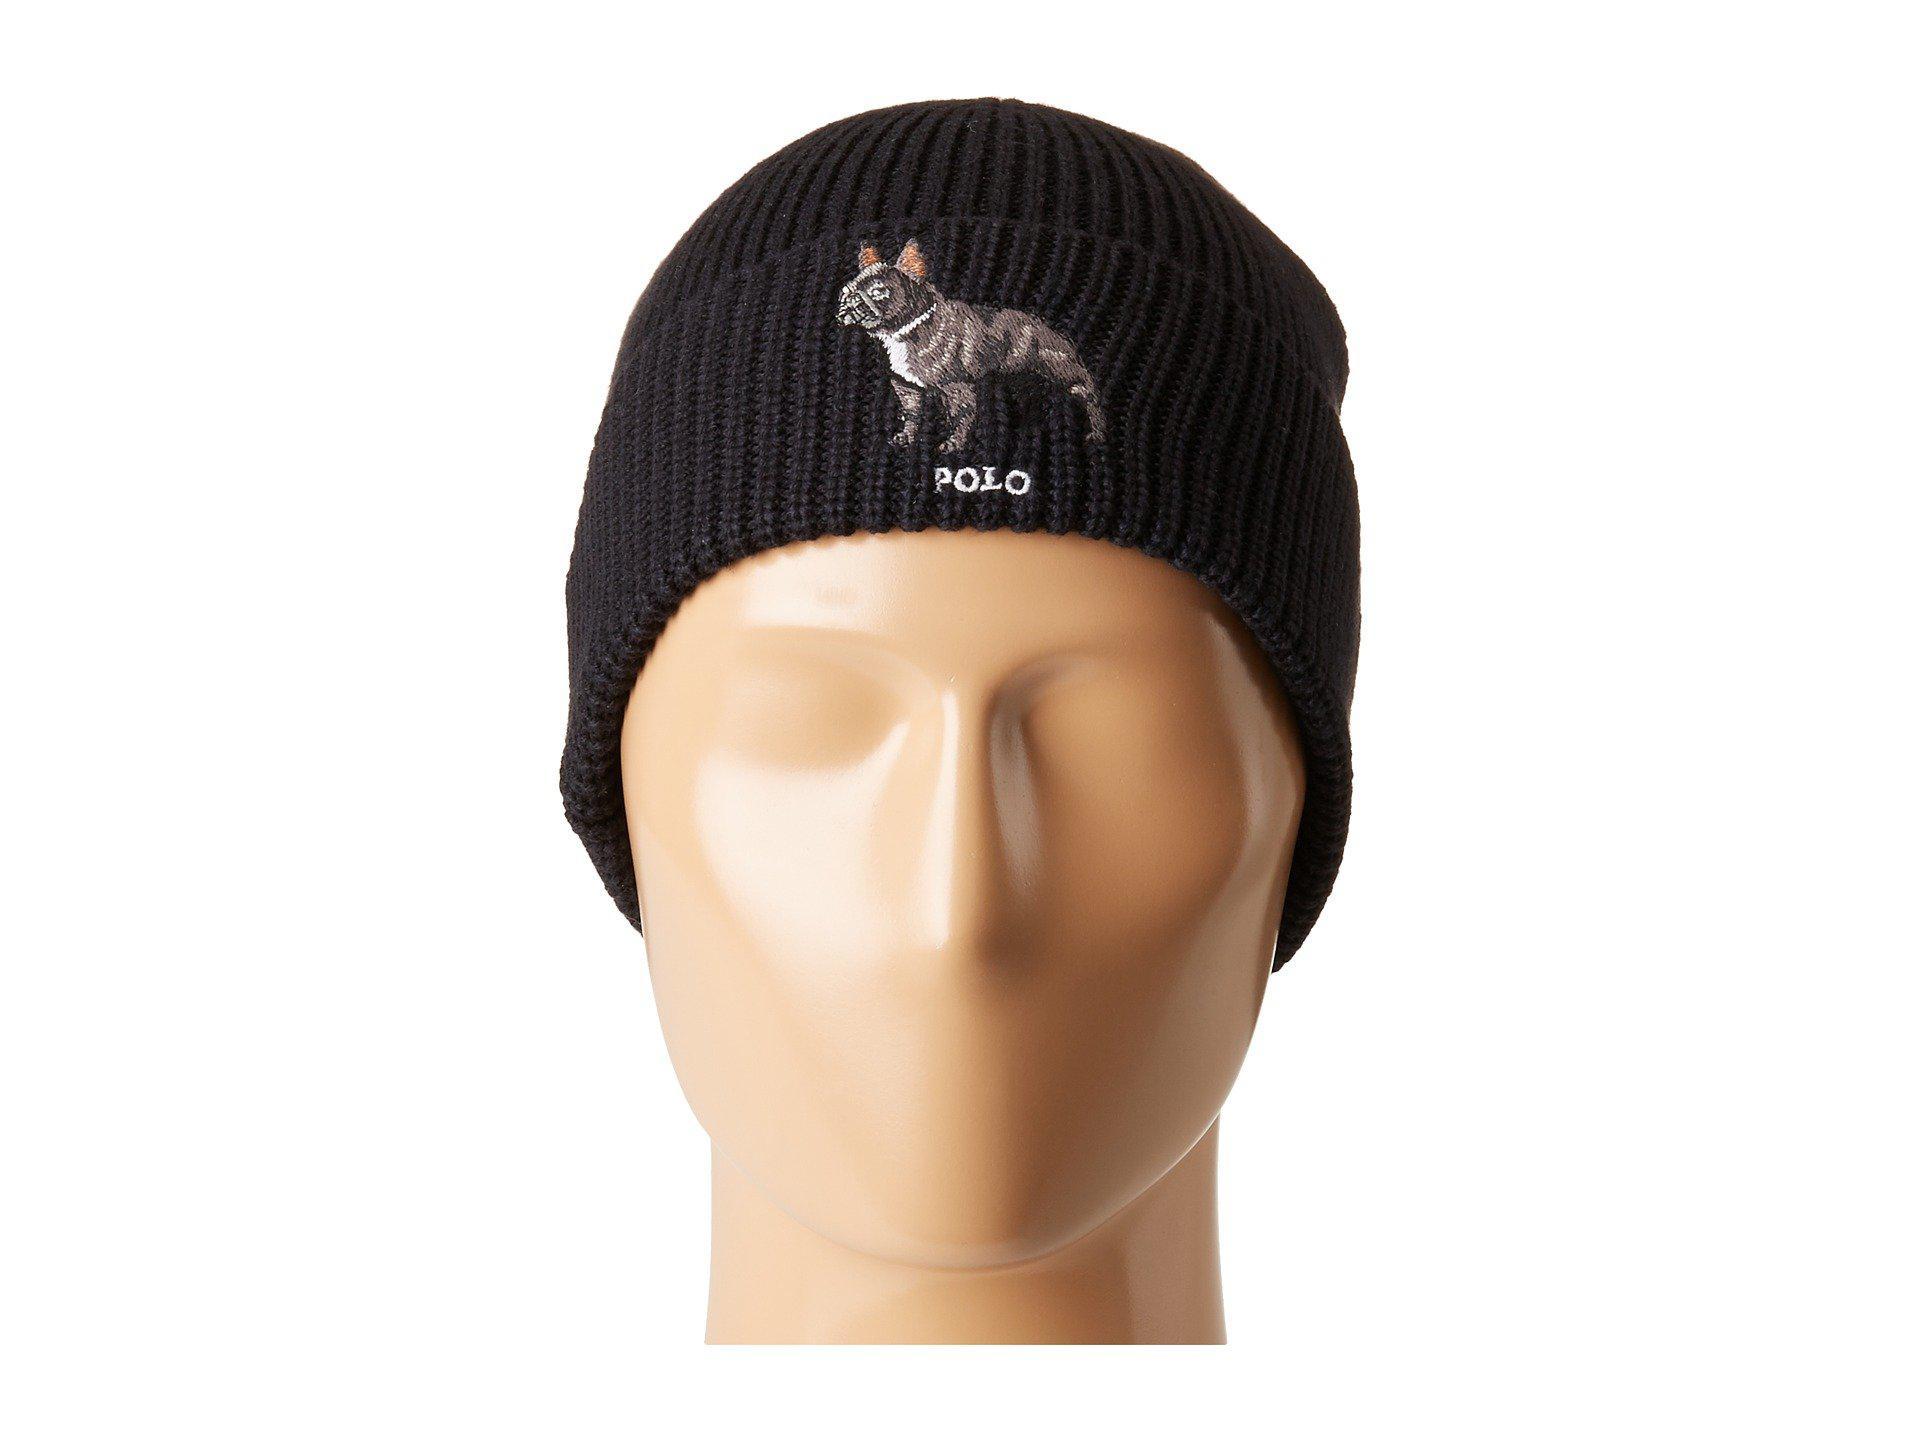 Lyst - Polo Ralph Lauren French Bulldog Watch Cap in Black for Men 8f8c86010e3